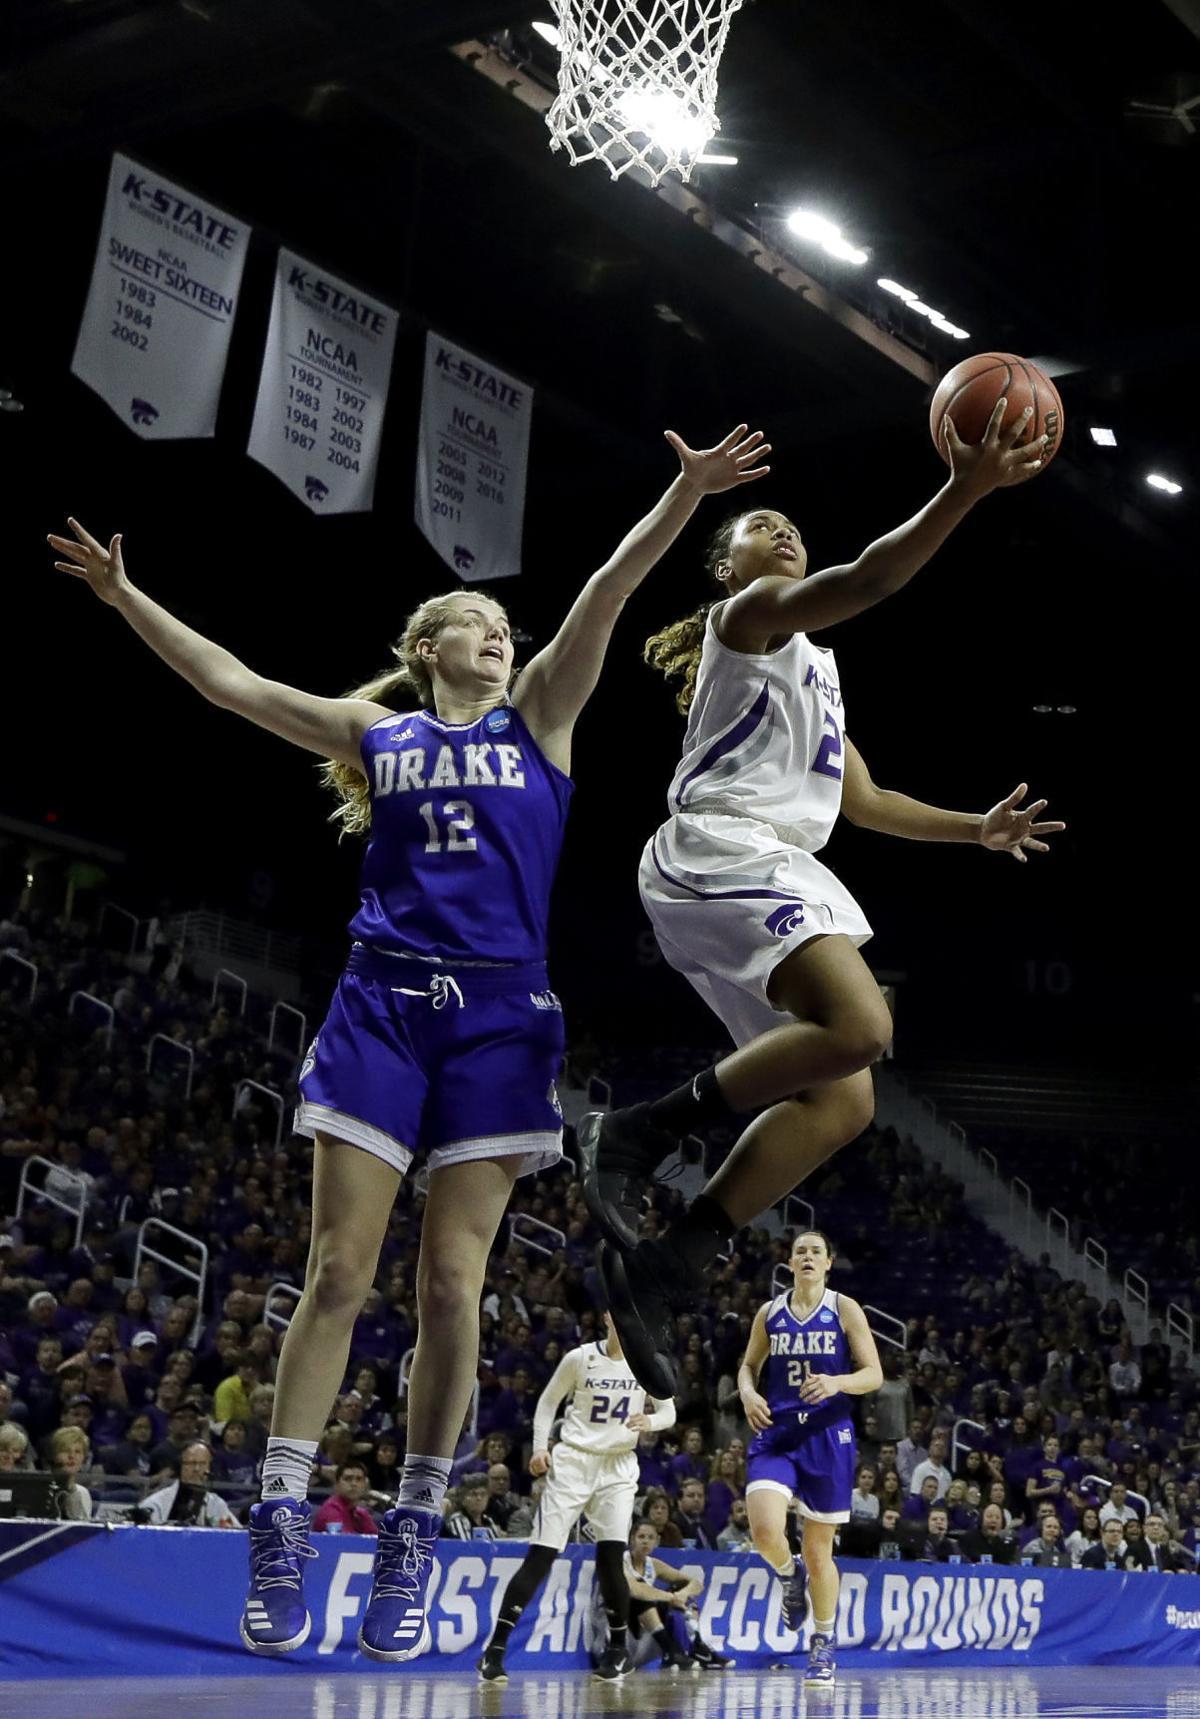 NCAA Drake Kansas St Basketball